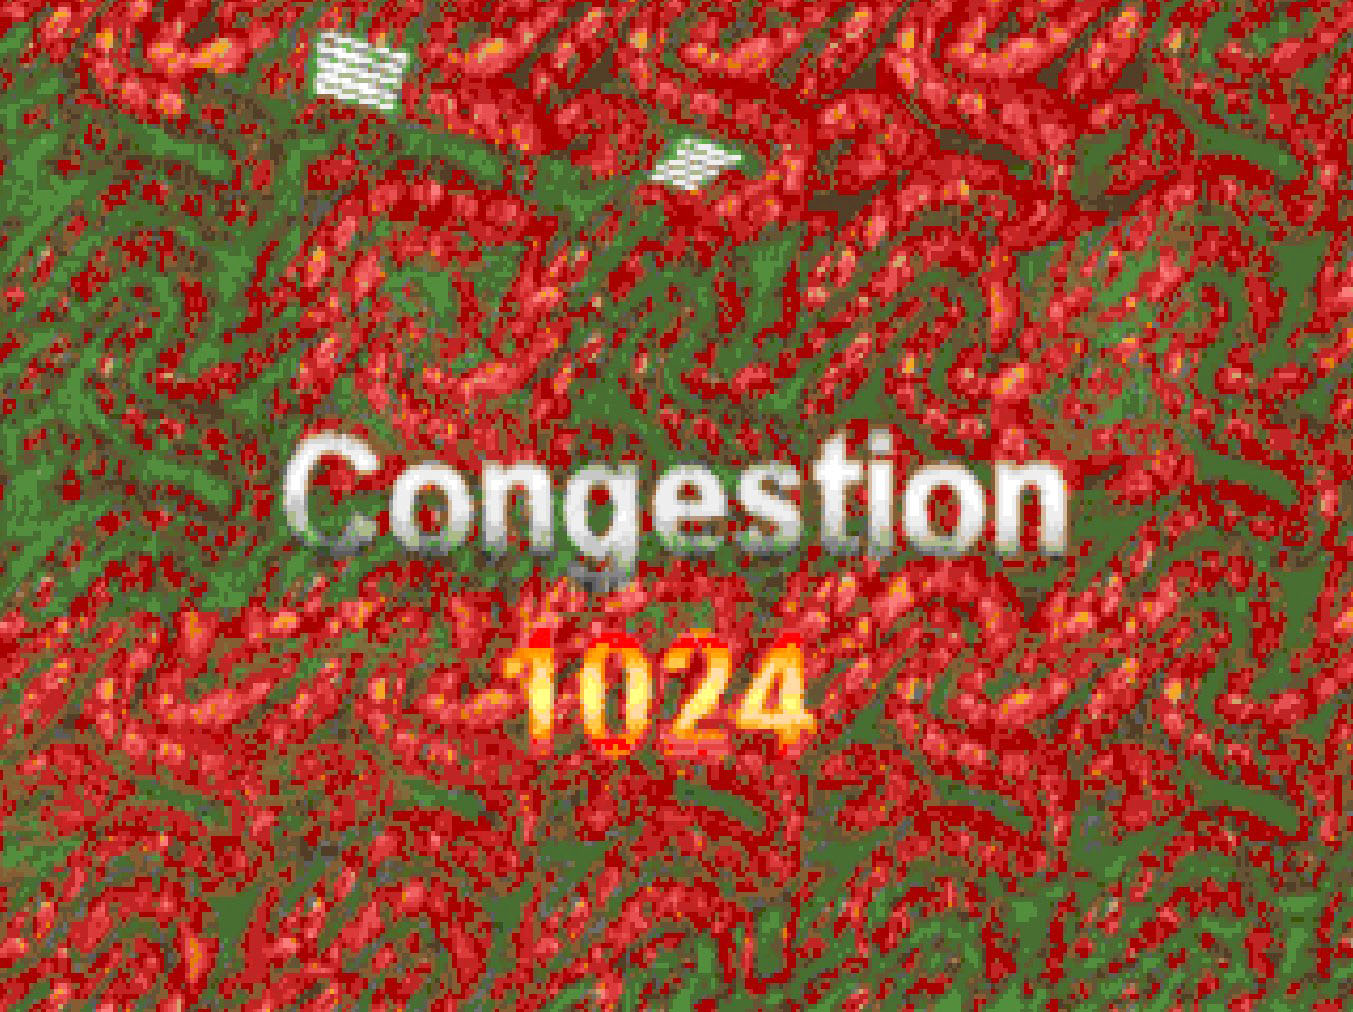 Congestion 1024